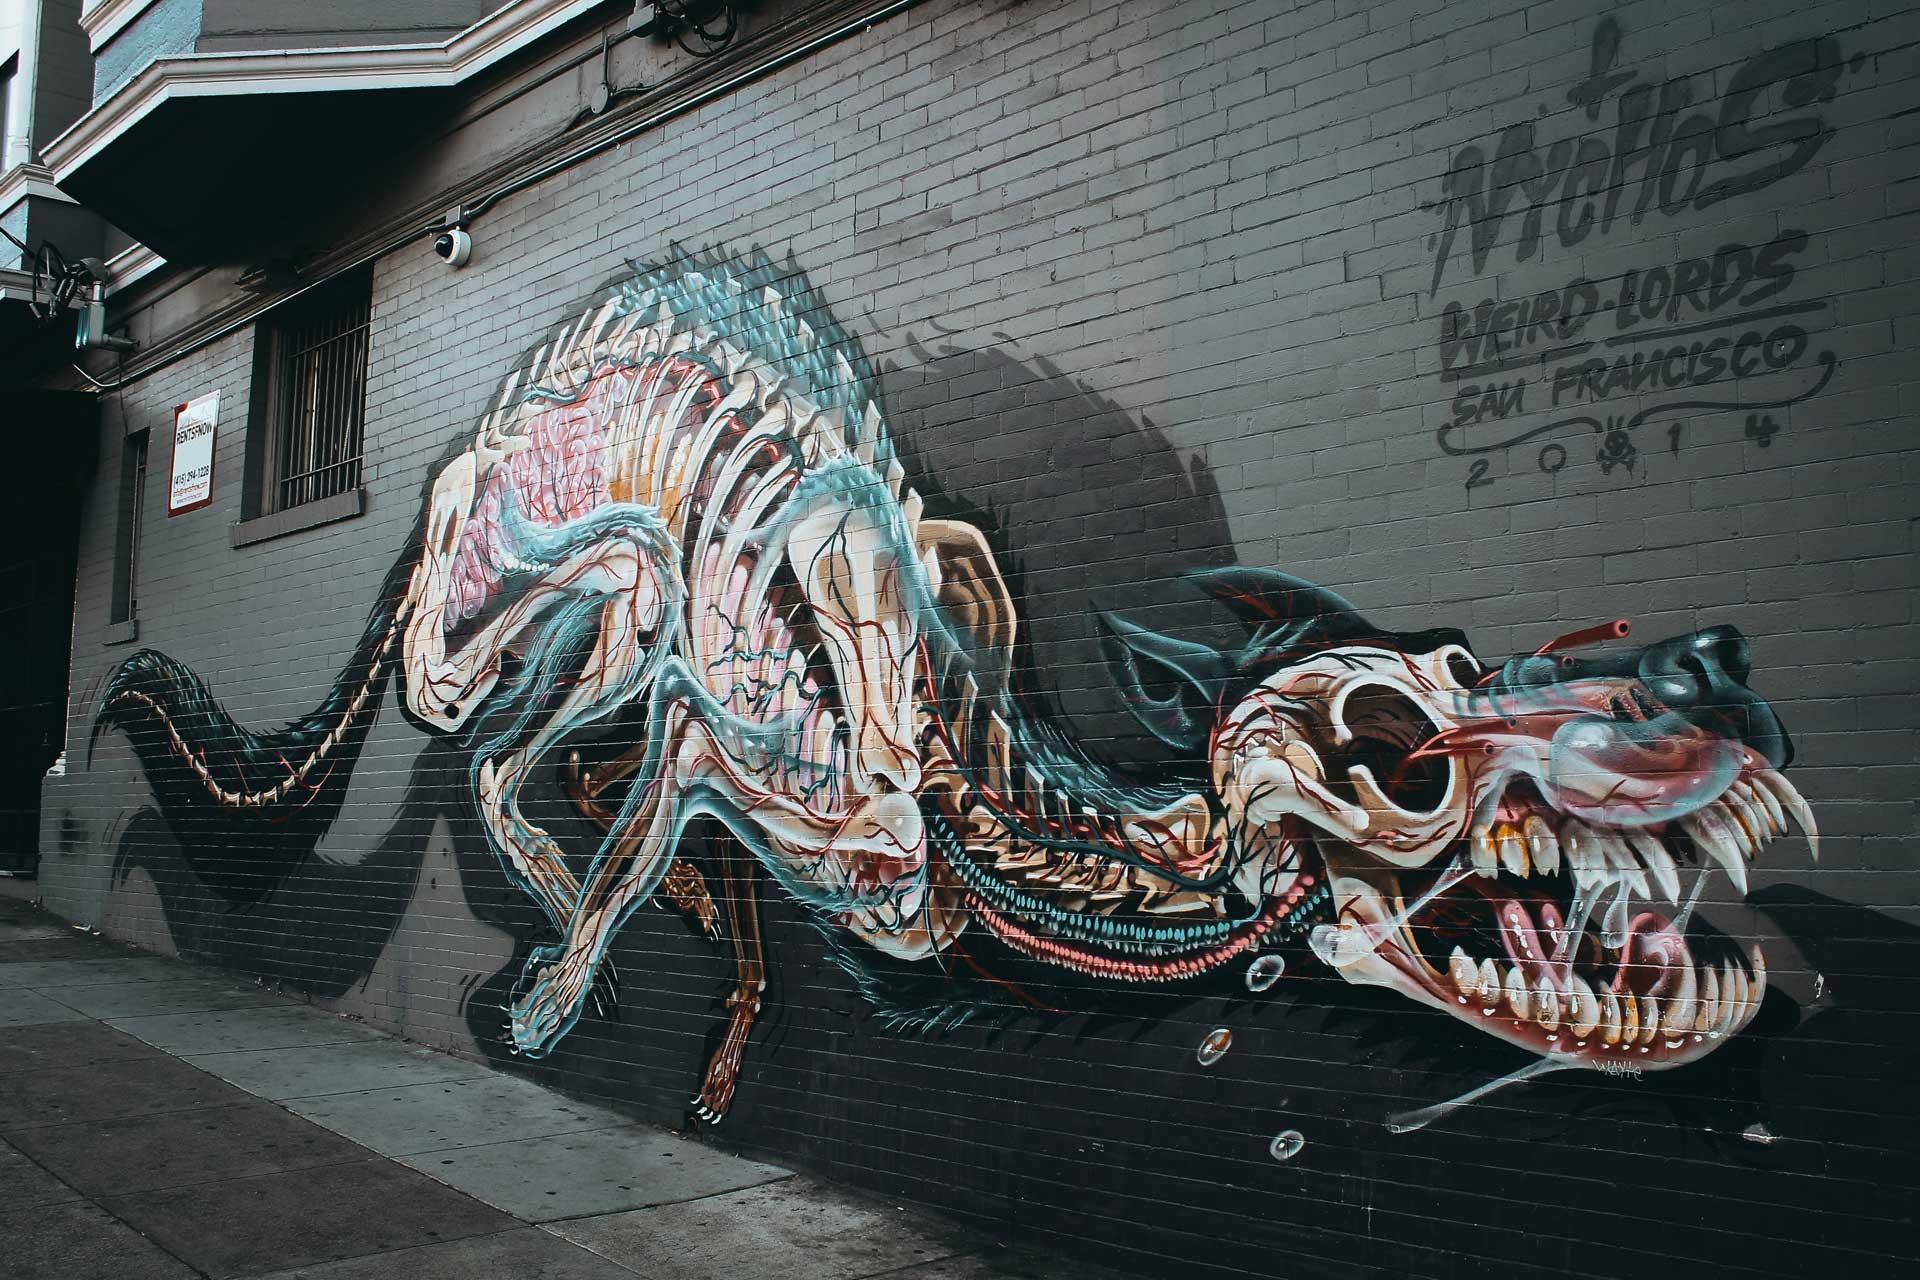 mural of dog skeleton on black wall